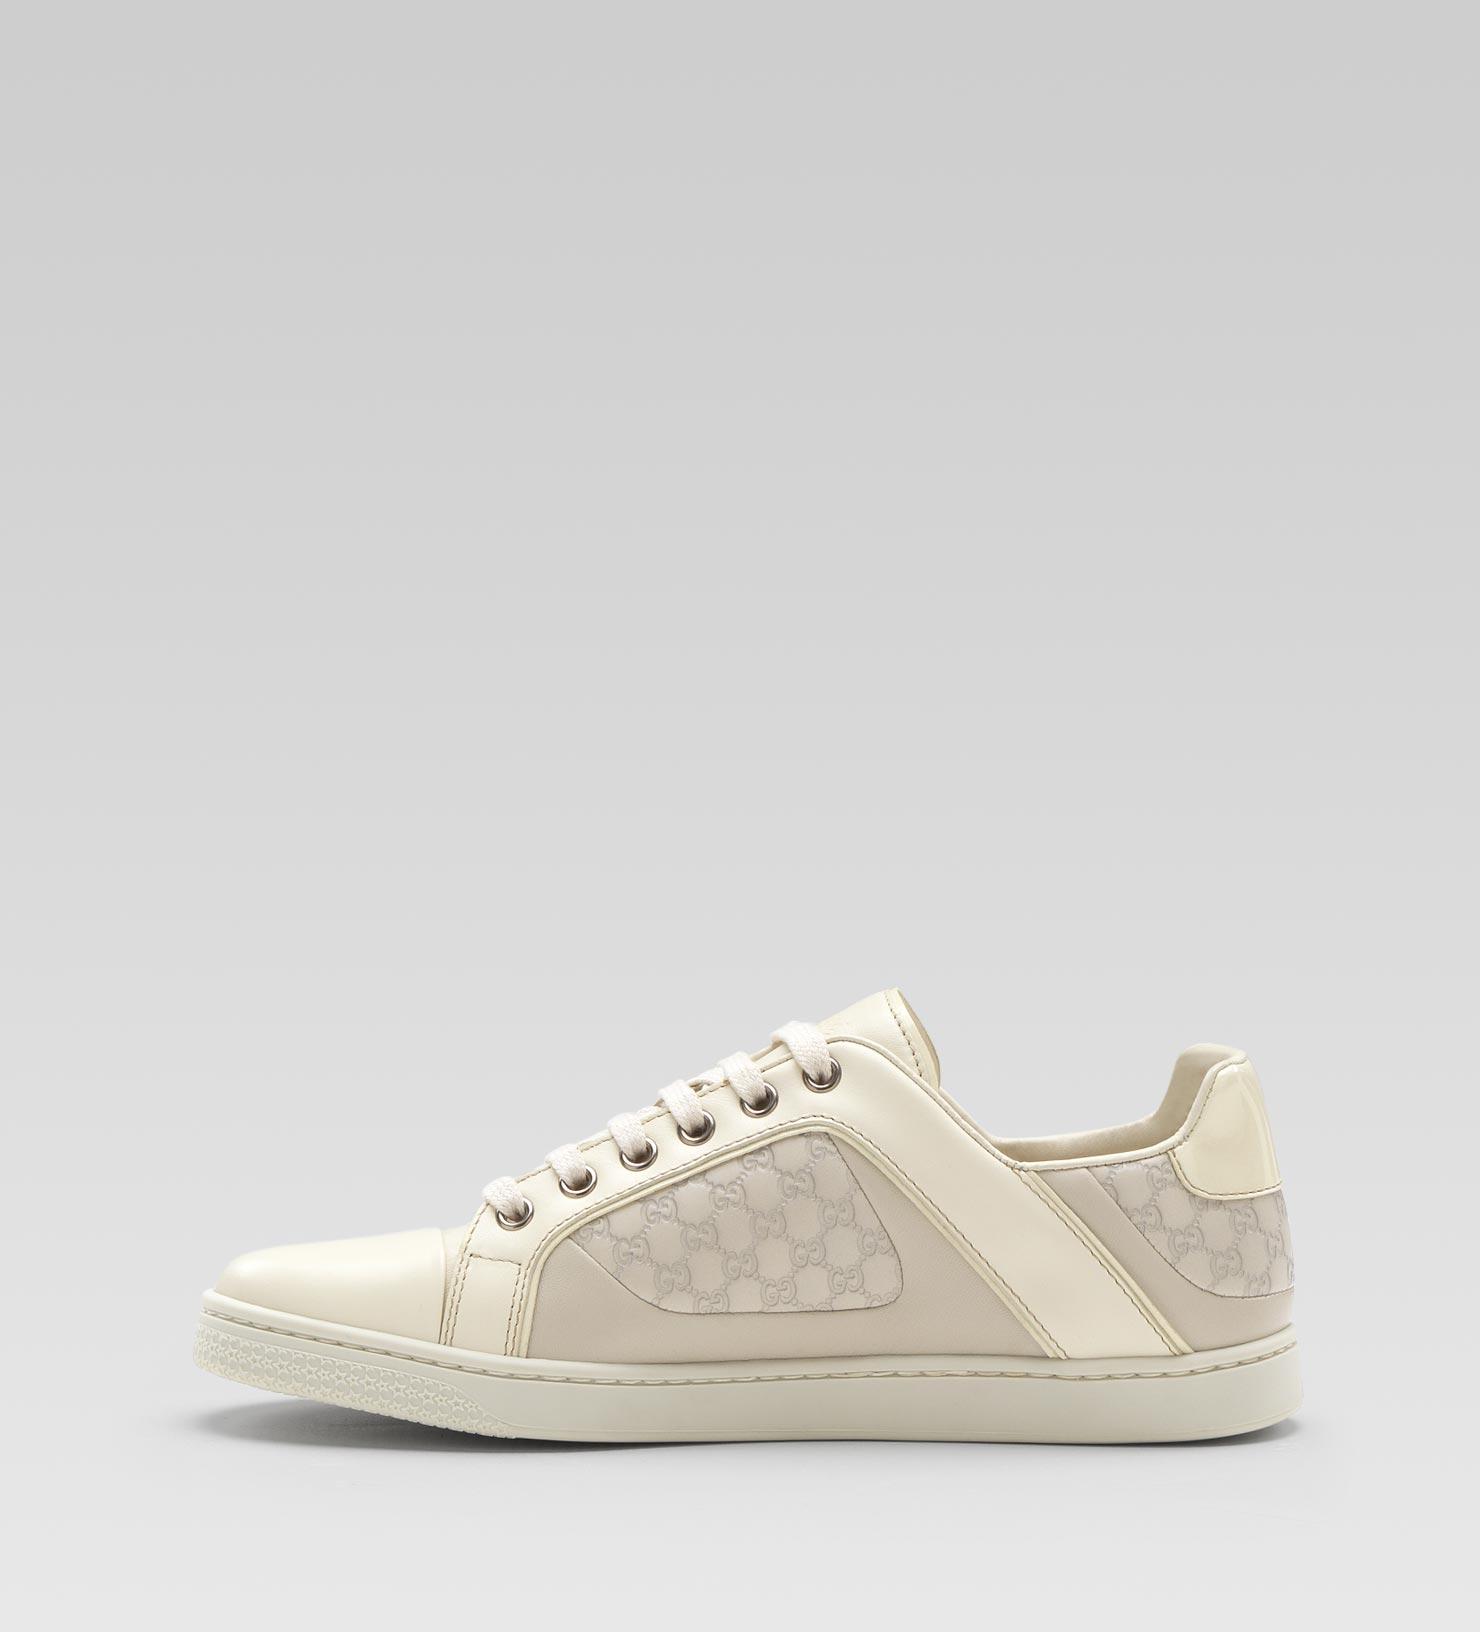 8e64d8987 Gucci Coda Pop Low Laceup Sneaker in White - Lyst